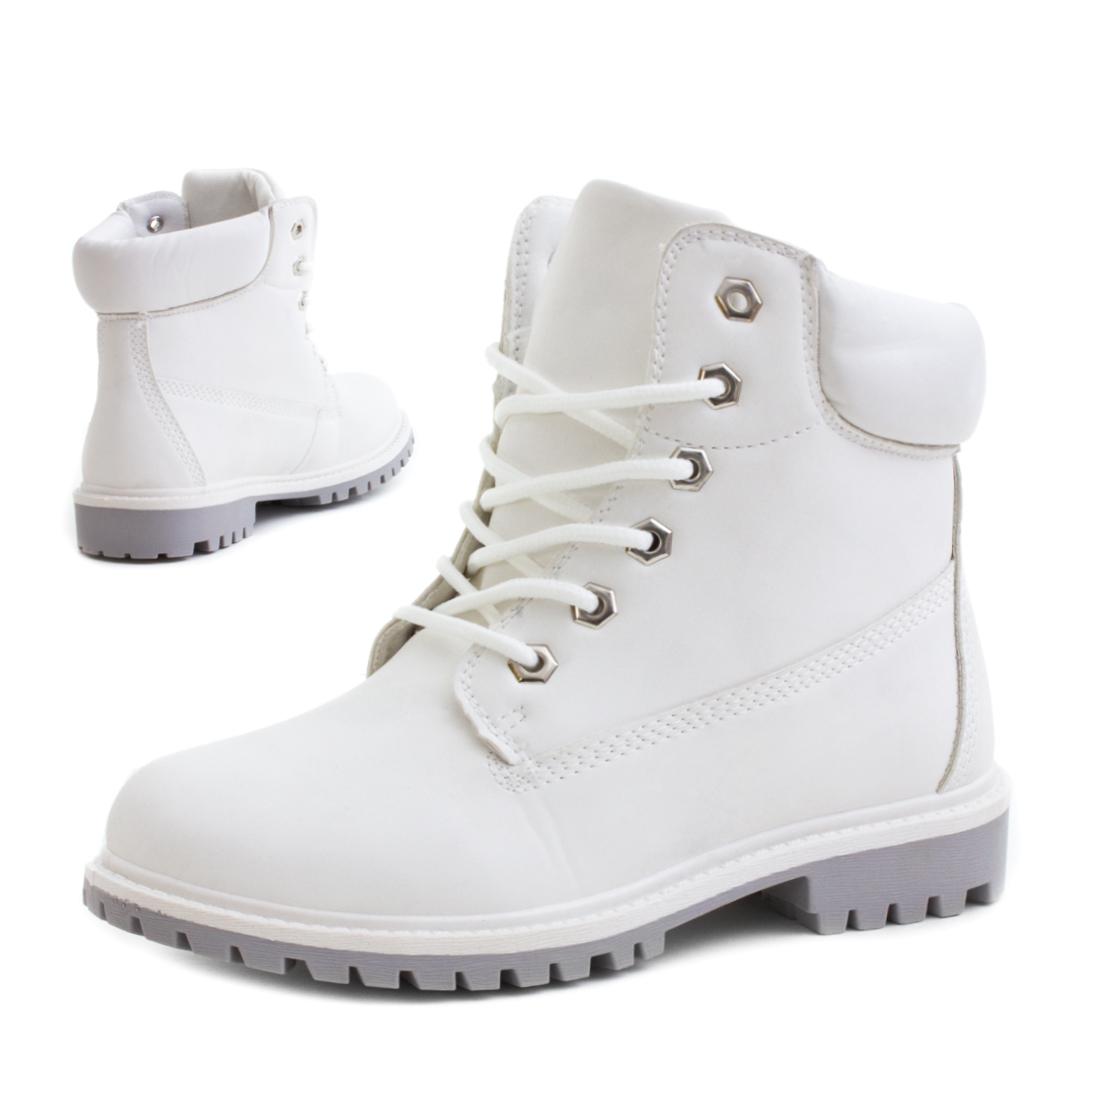 neu damen winter boots outdoor schuhe schn r stiefel gr e 37 38 39 40 41 42 43 ebay. Black Bedroom Furniture Sets. Home Design Ideas